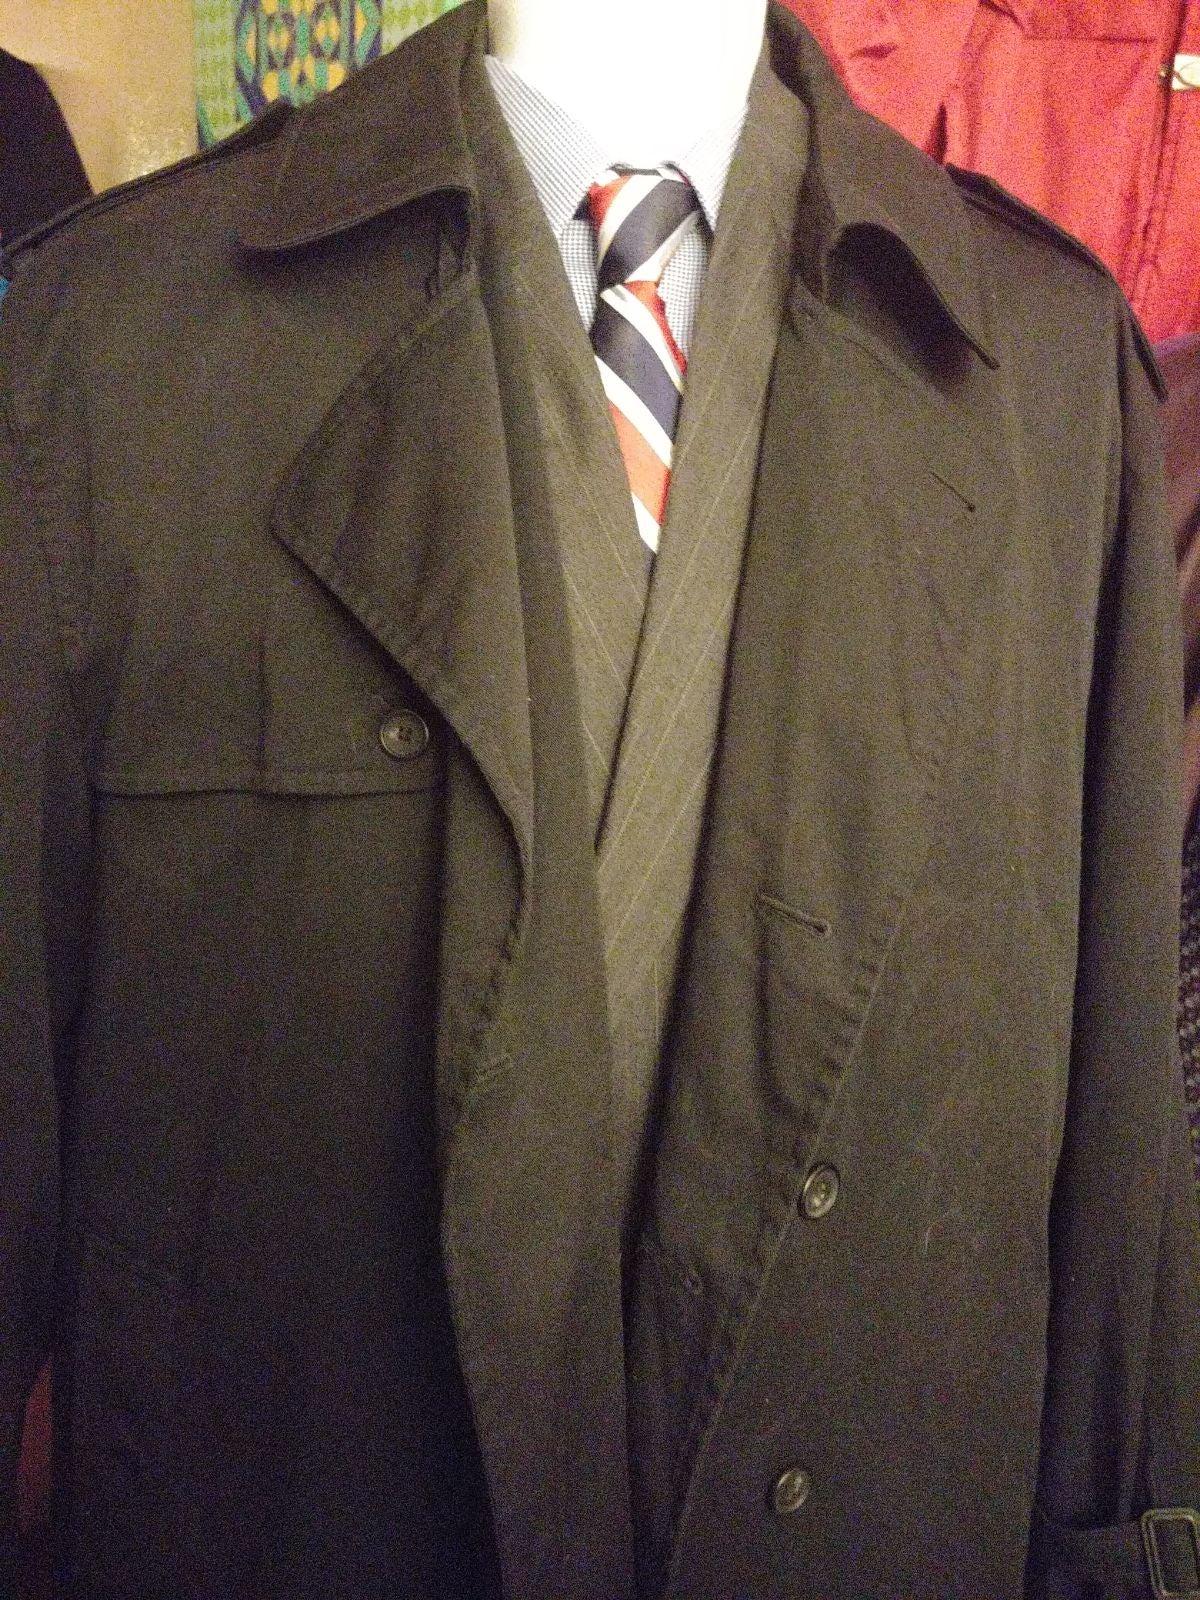 Trench Coat By Bill Blass Black Mens XLG